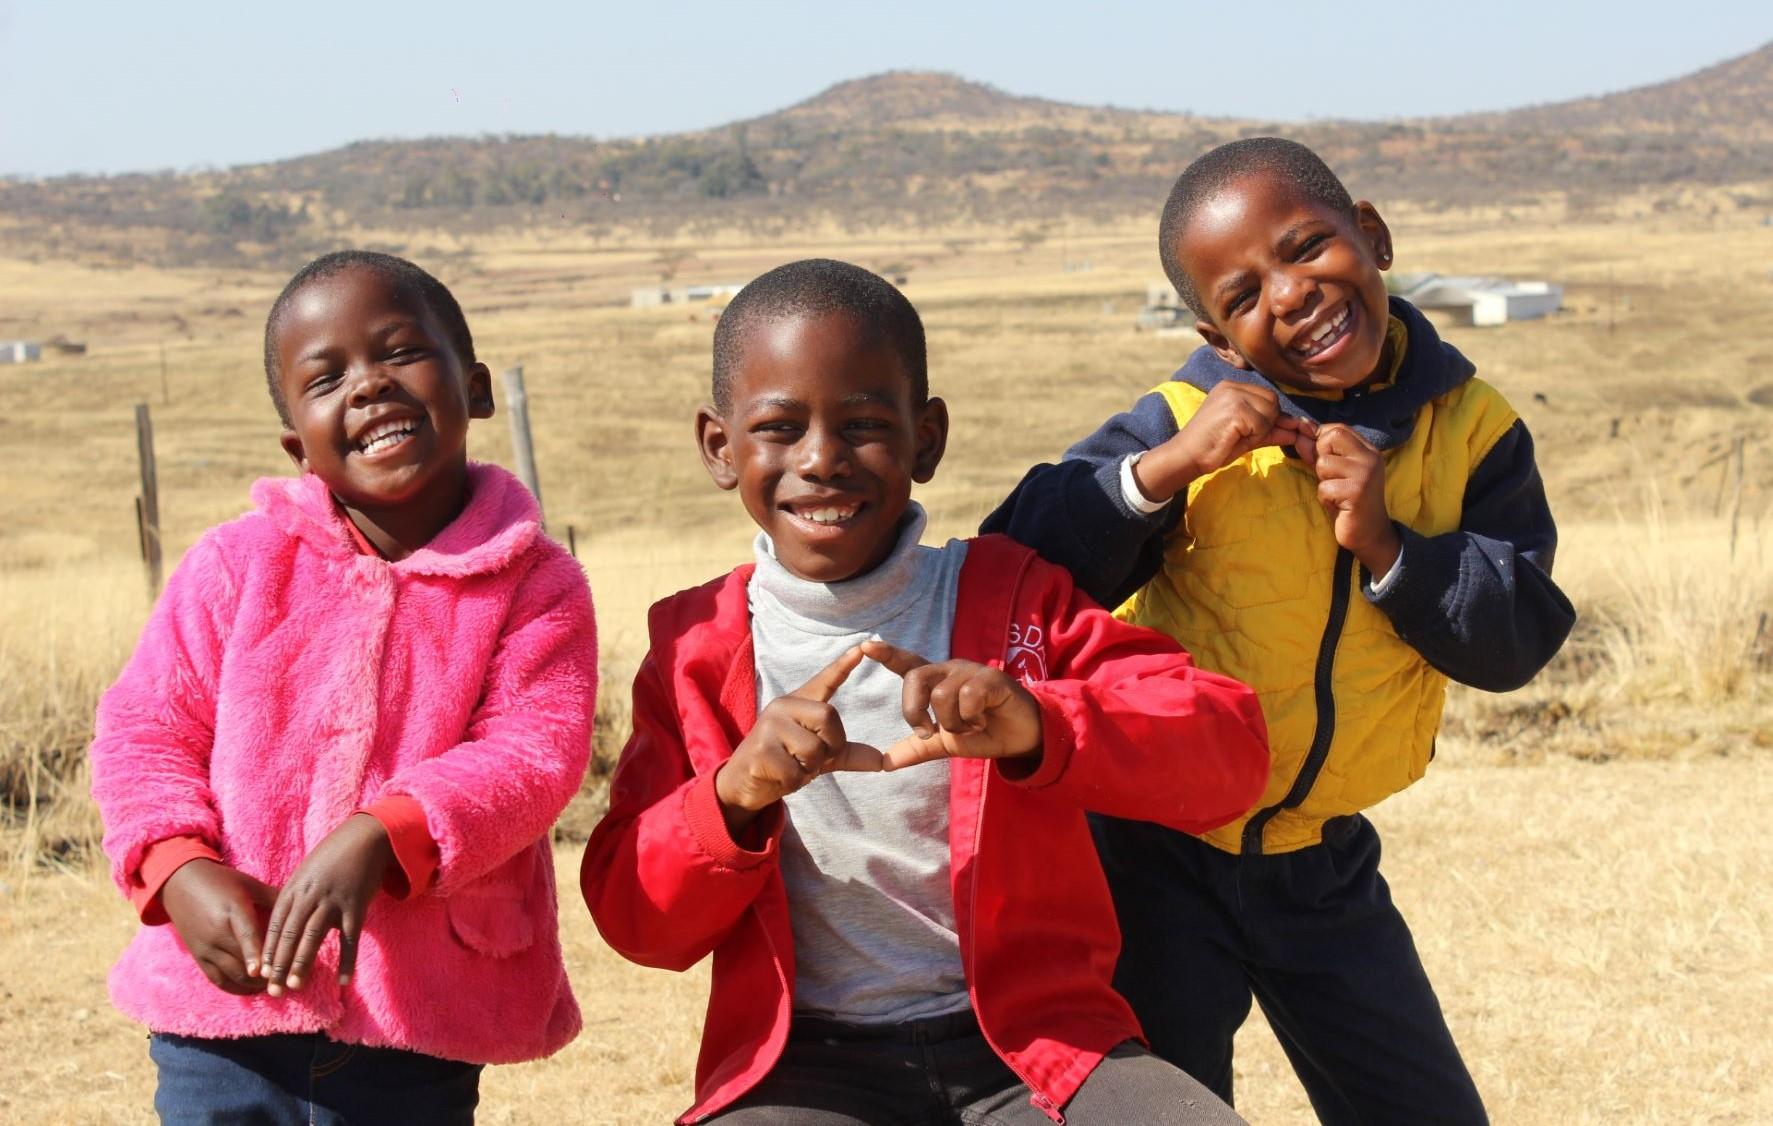 Joyful Children in South Africa